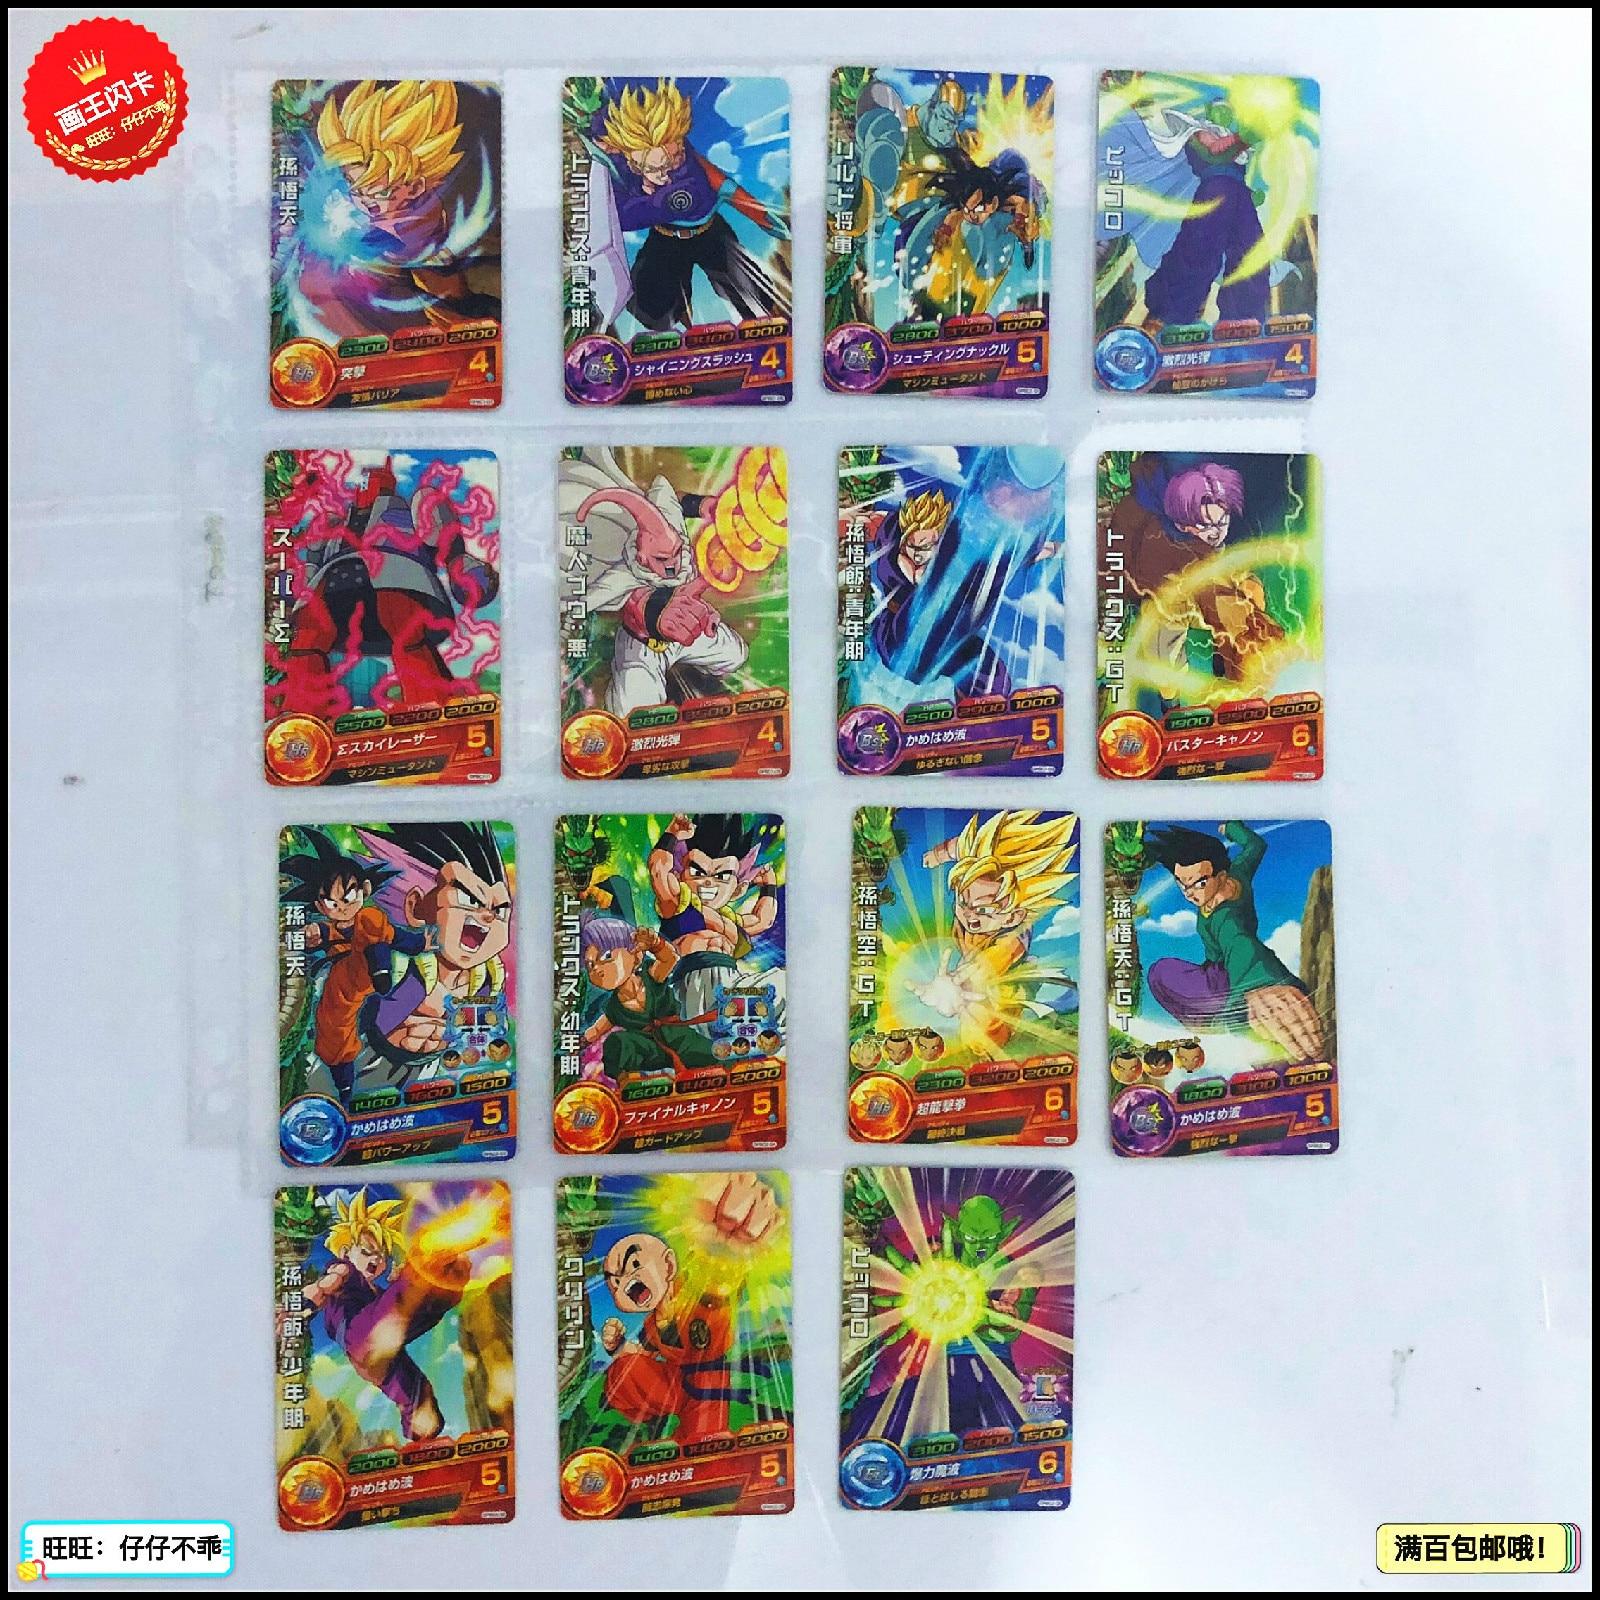 Japan Original Dragon Ball Hero Card  GPBC1 2 Goku Toys Hobbies Collectibles Game Collection Anime Cards